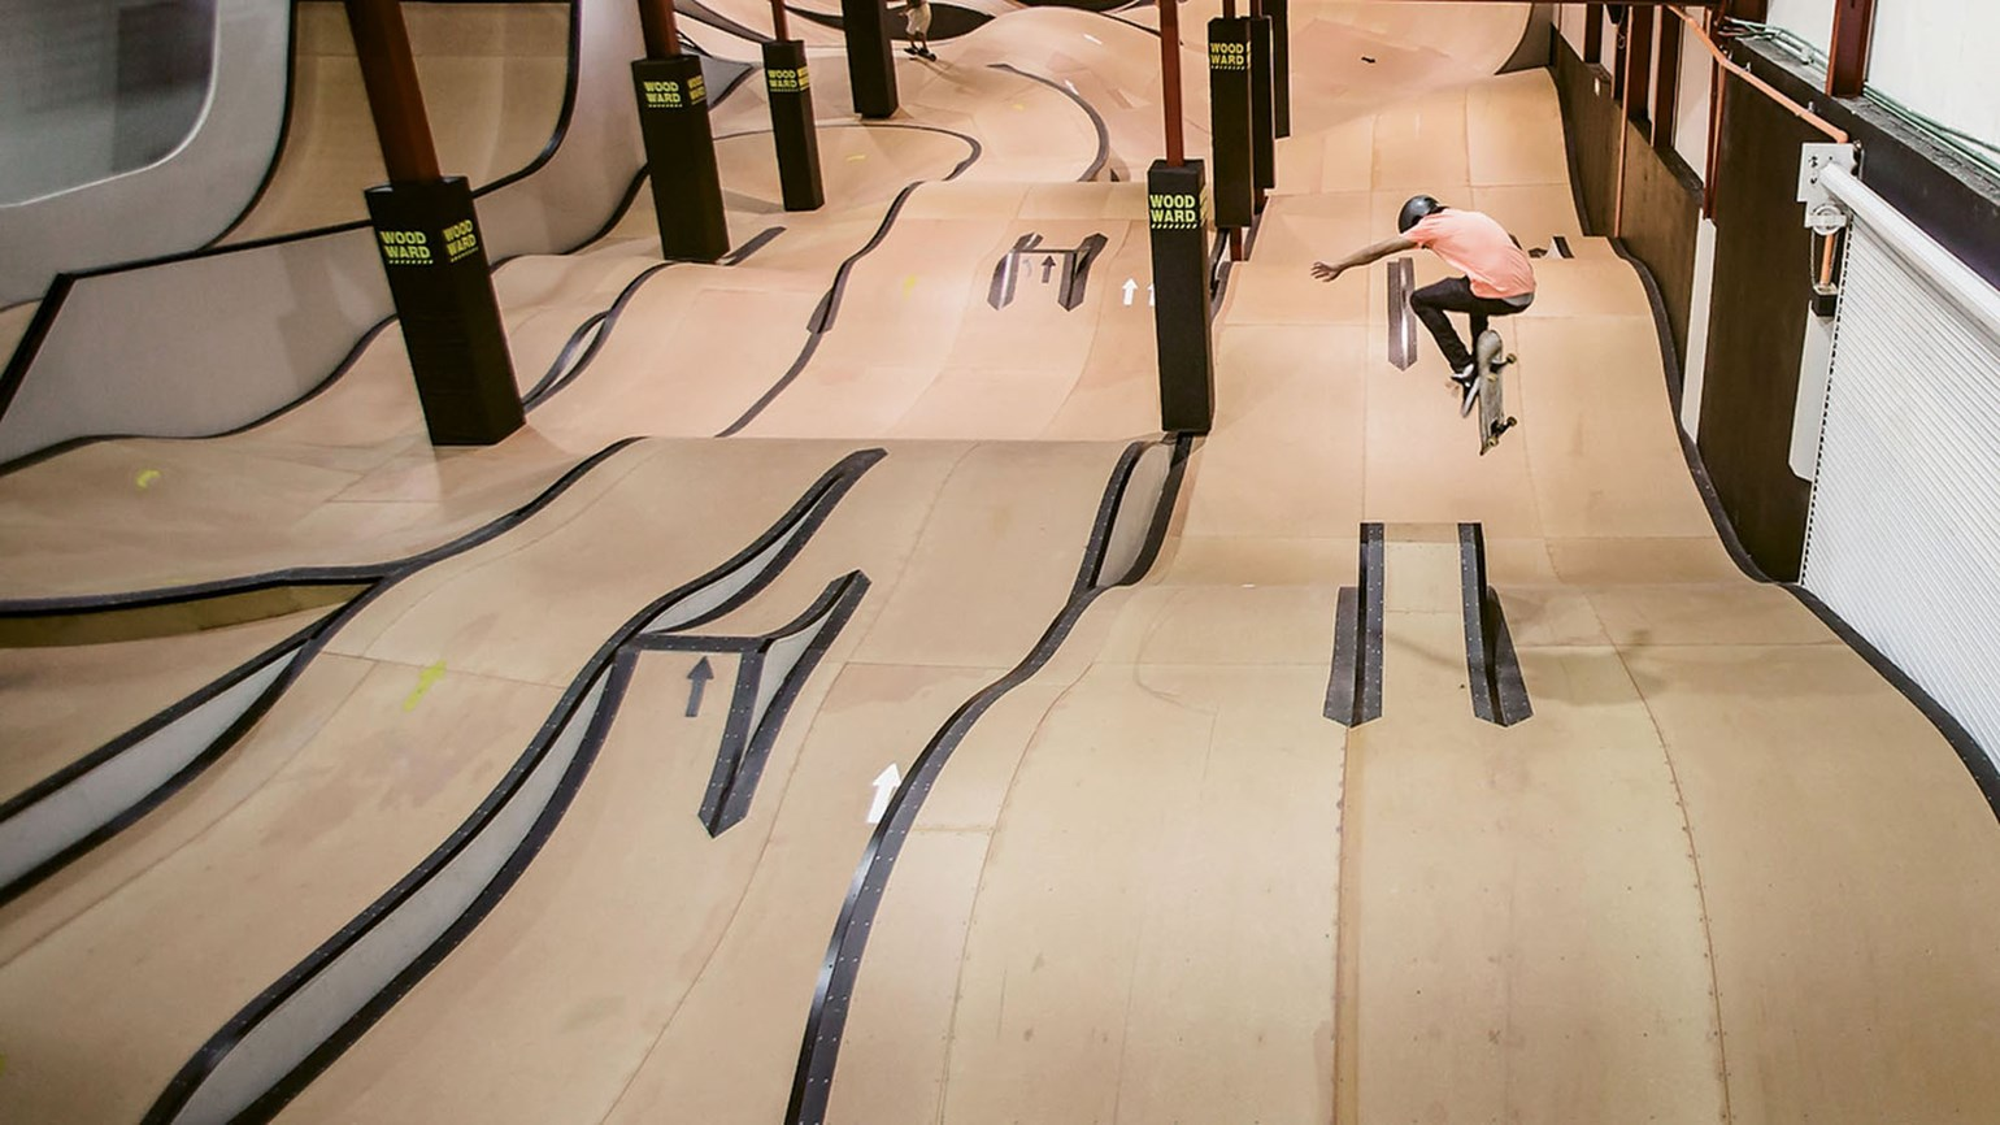 Learn to skate dubai map